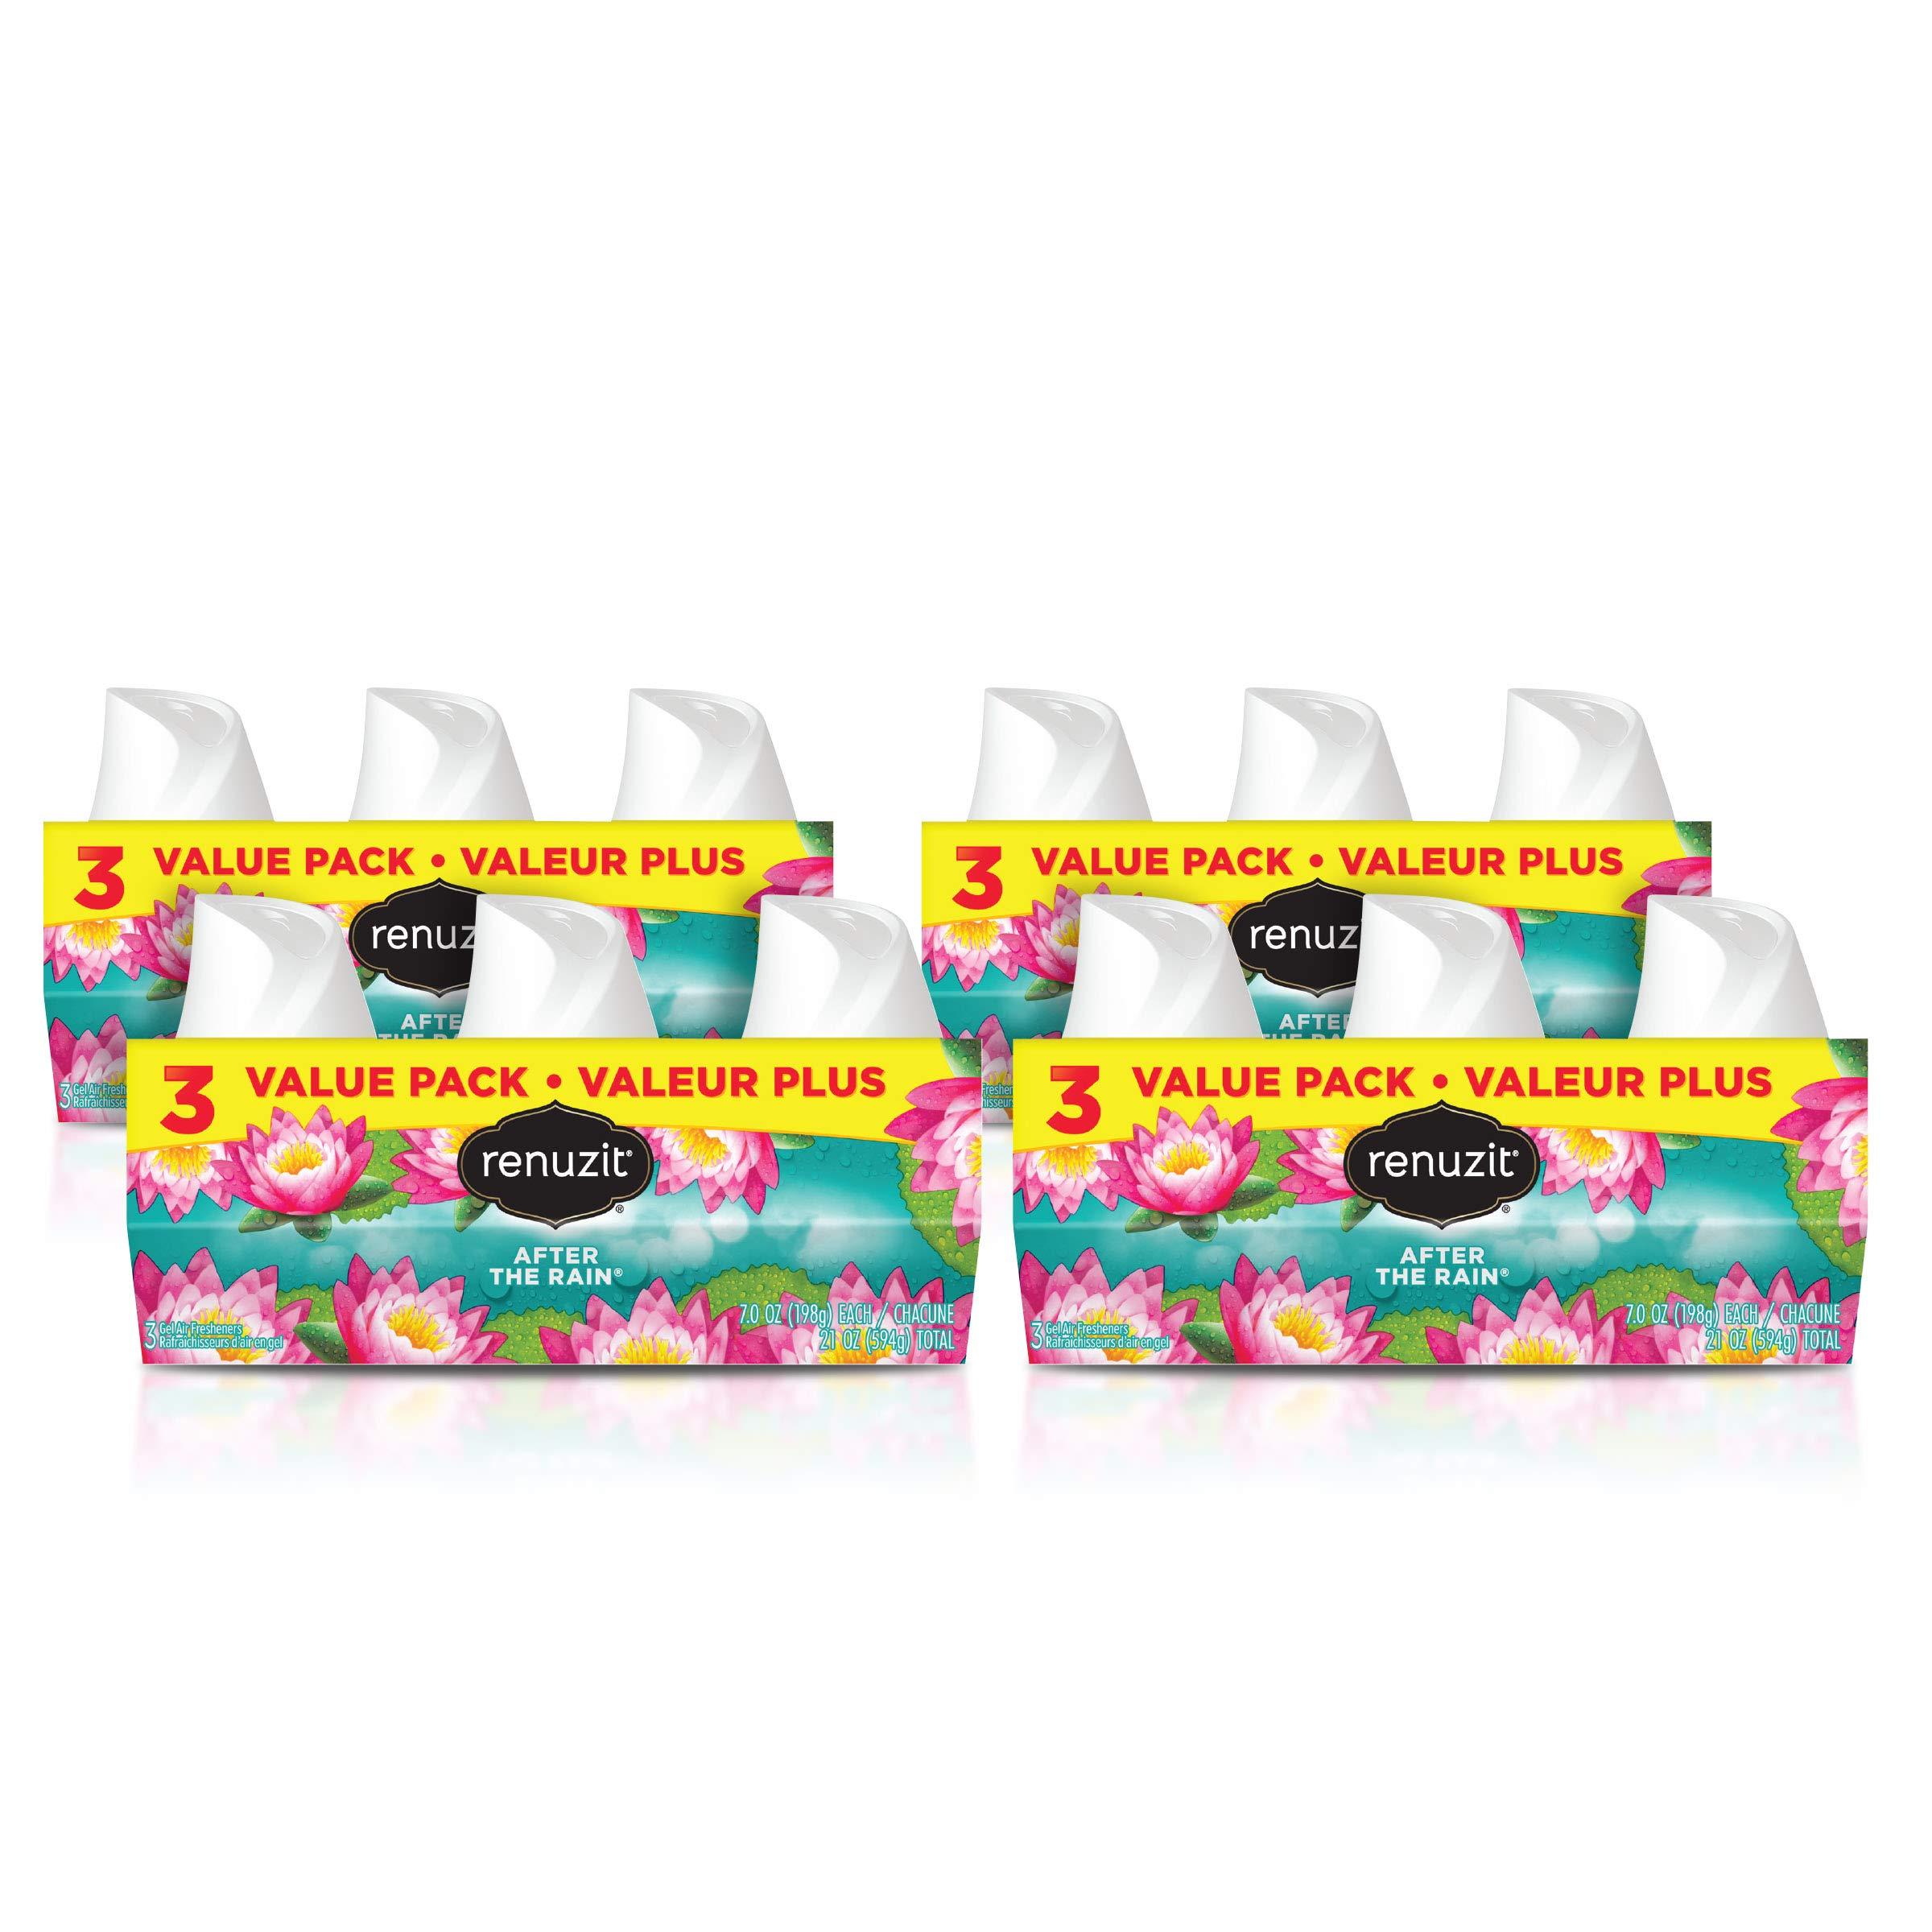 Renuzit Gel Air Freshener, After The Rain, 3 Pack, 4Count, 12 Total Air Fresheners